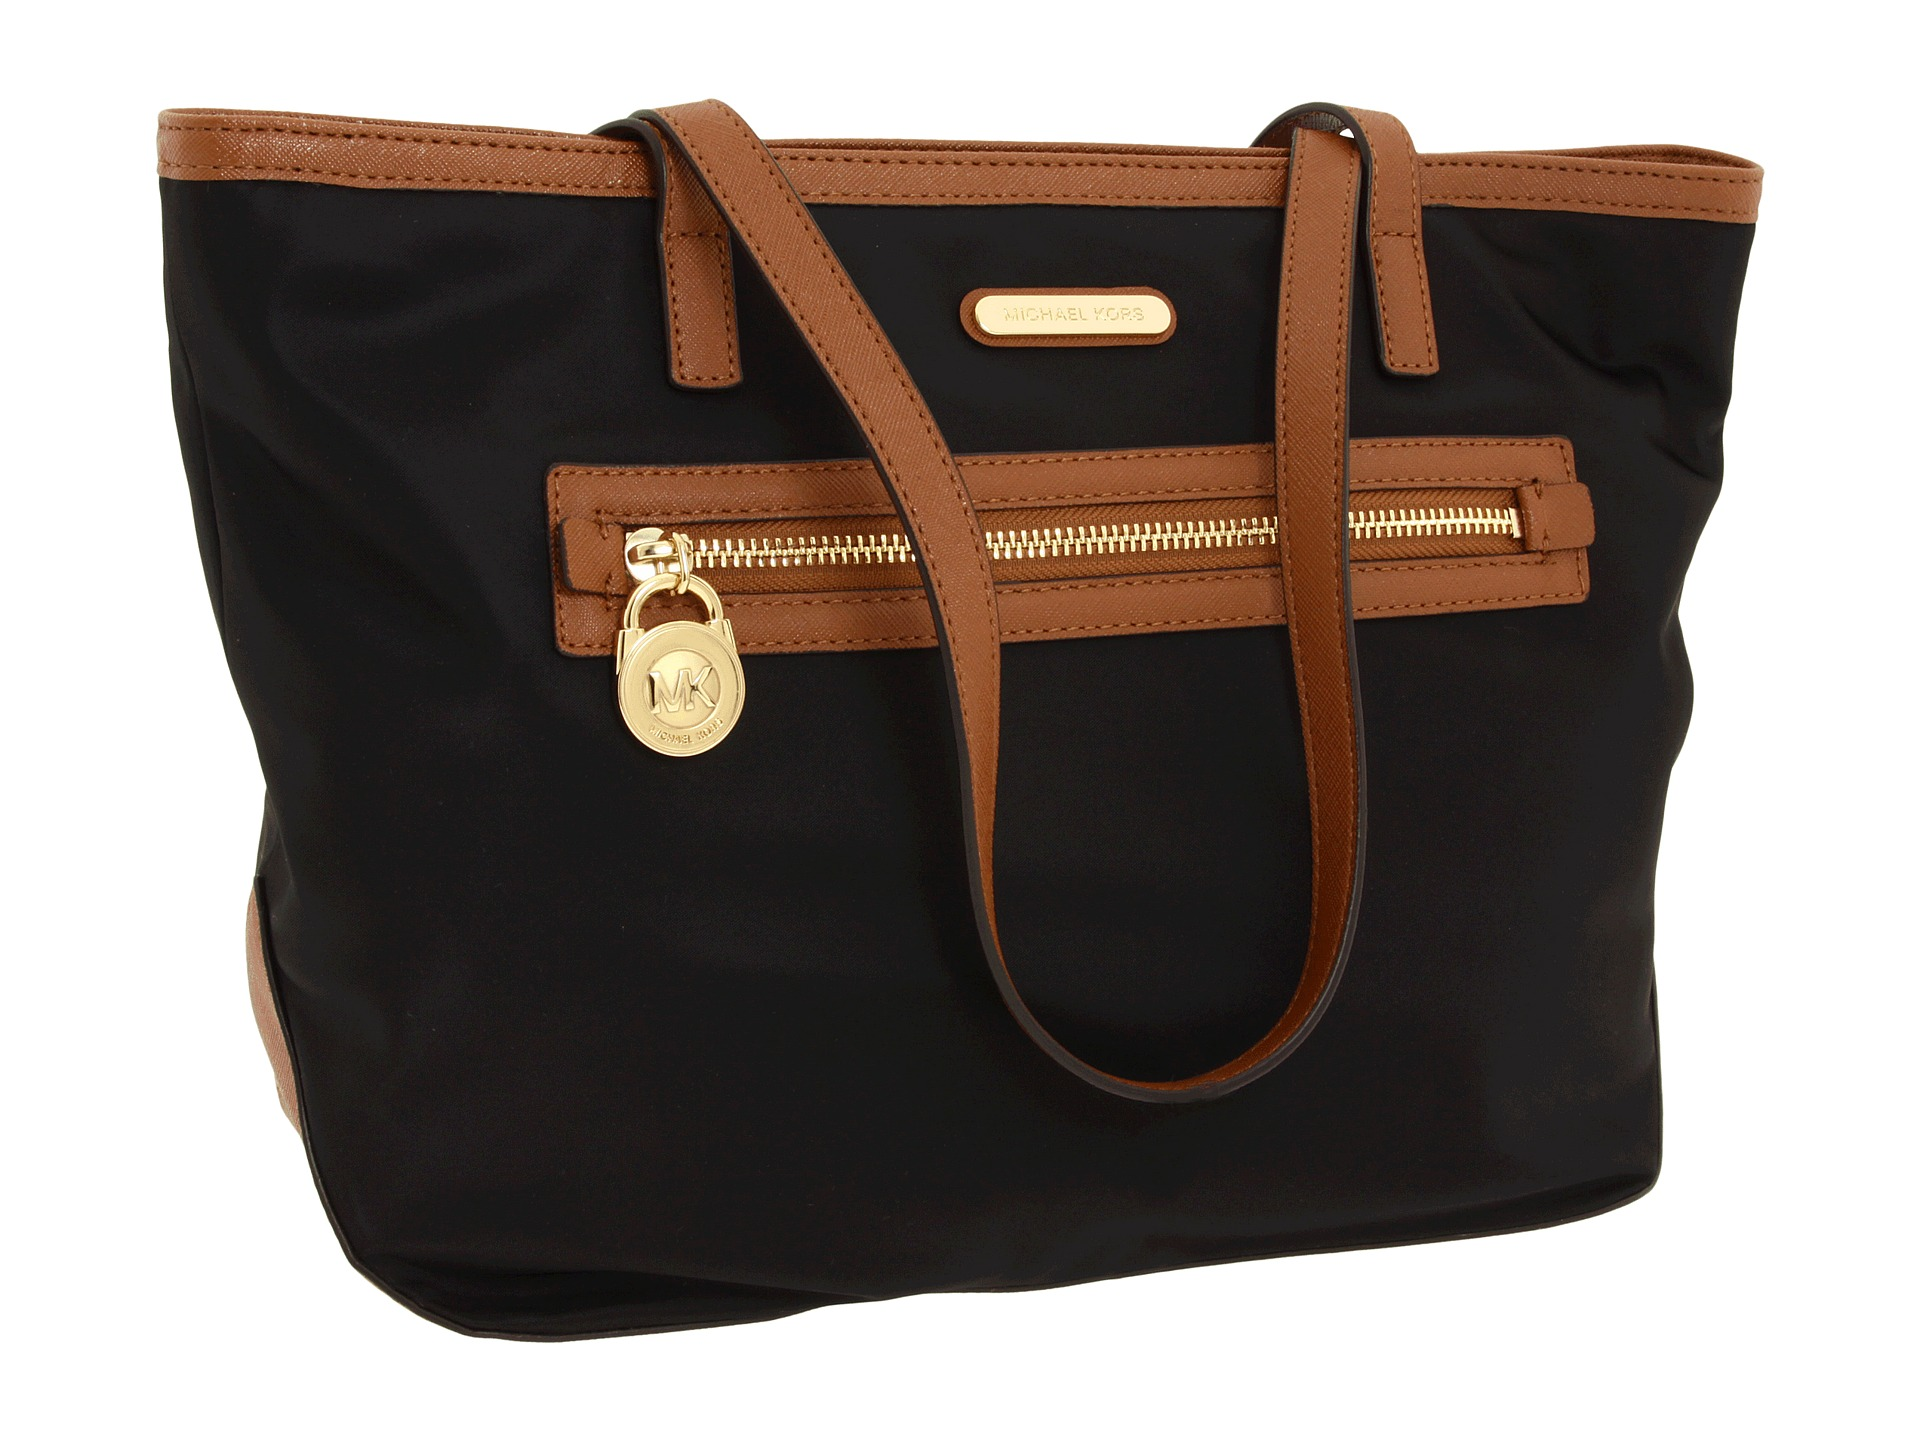 43ea0703db4a67 Michael Kors Kempton Small Tote Handbag | Stanford Center for ...